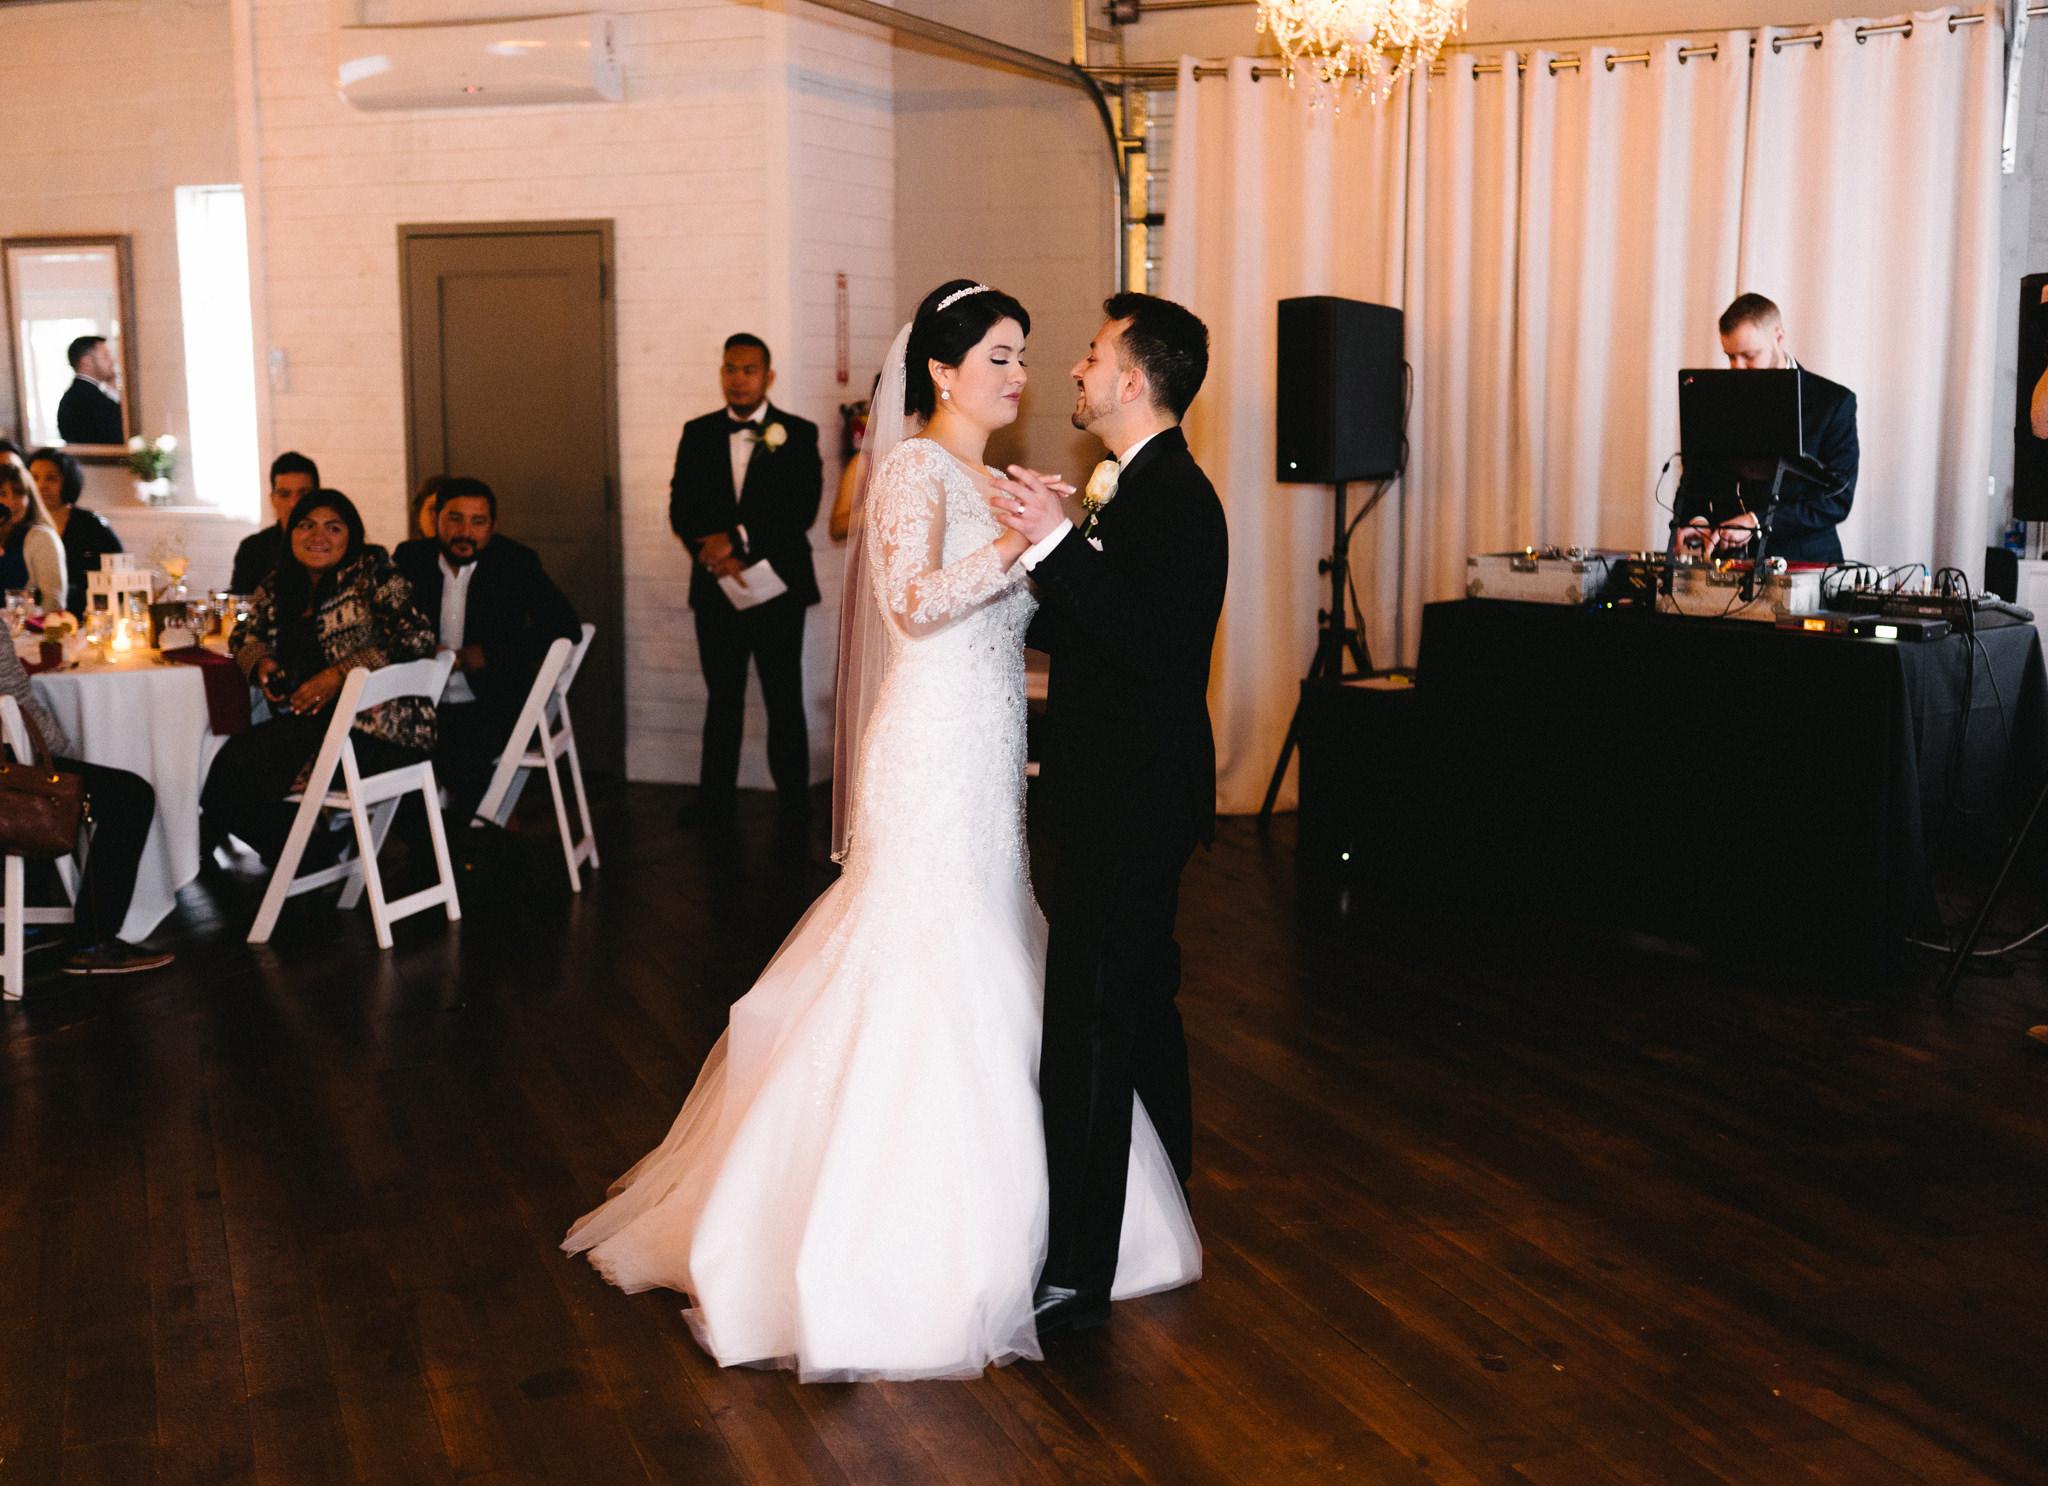 043-rempel-photography-chicago-wedding-inspiration-susan-daniel-michigan-metro-detroit-christian-church-holly-vault-cupcakes-and-kisses.jpg